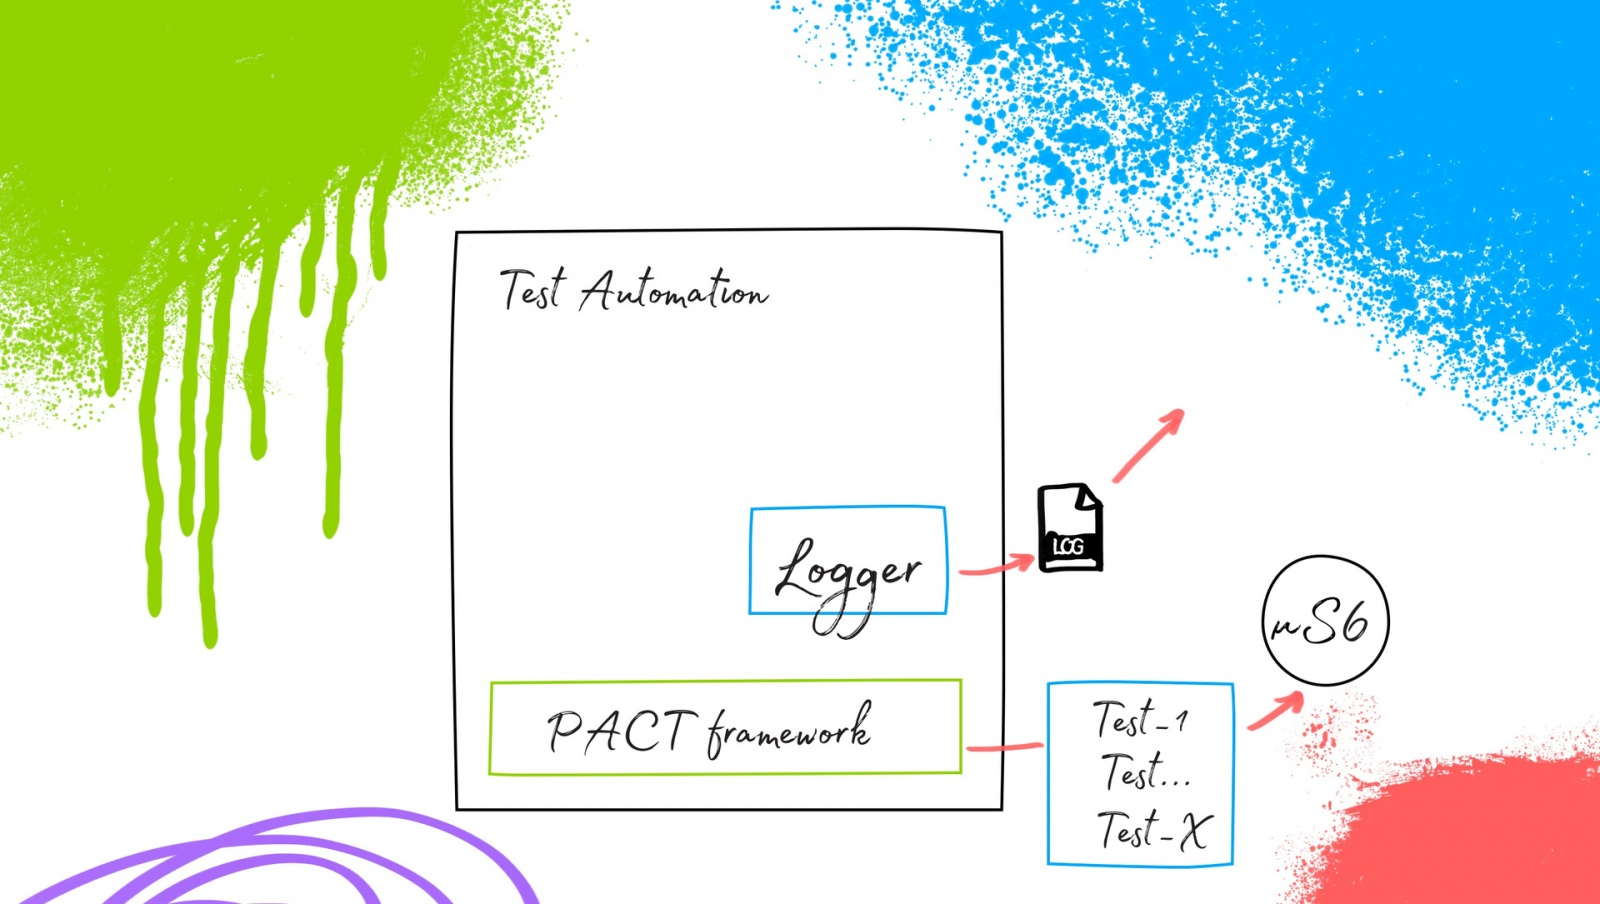 Ядро автоматизации тестирования в микросервисной архитектуре - 4